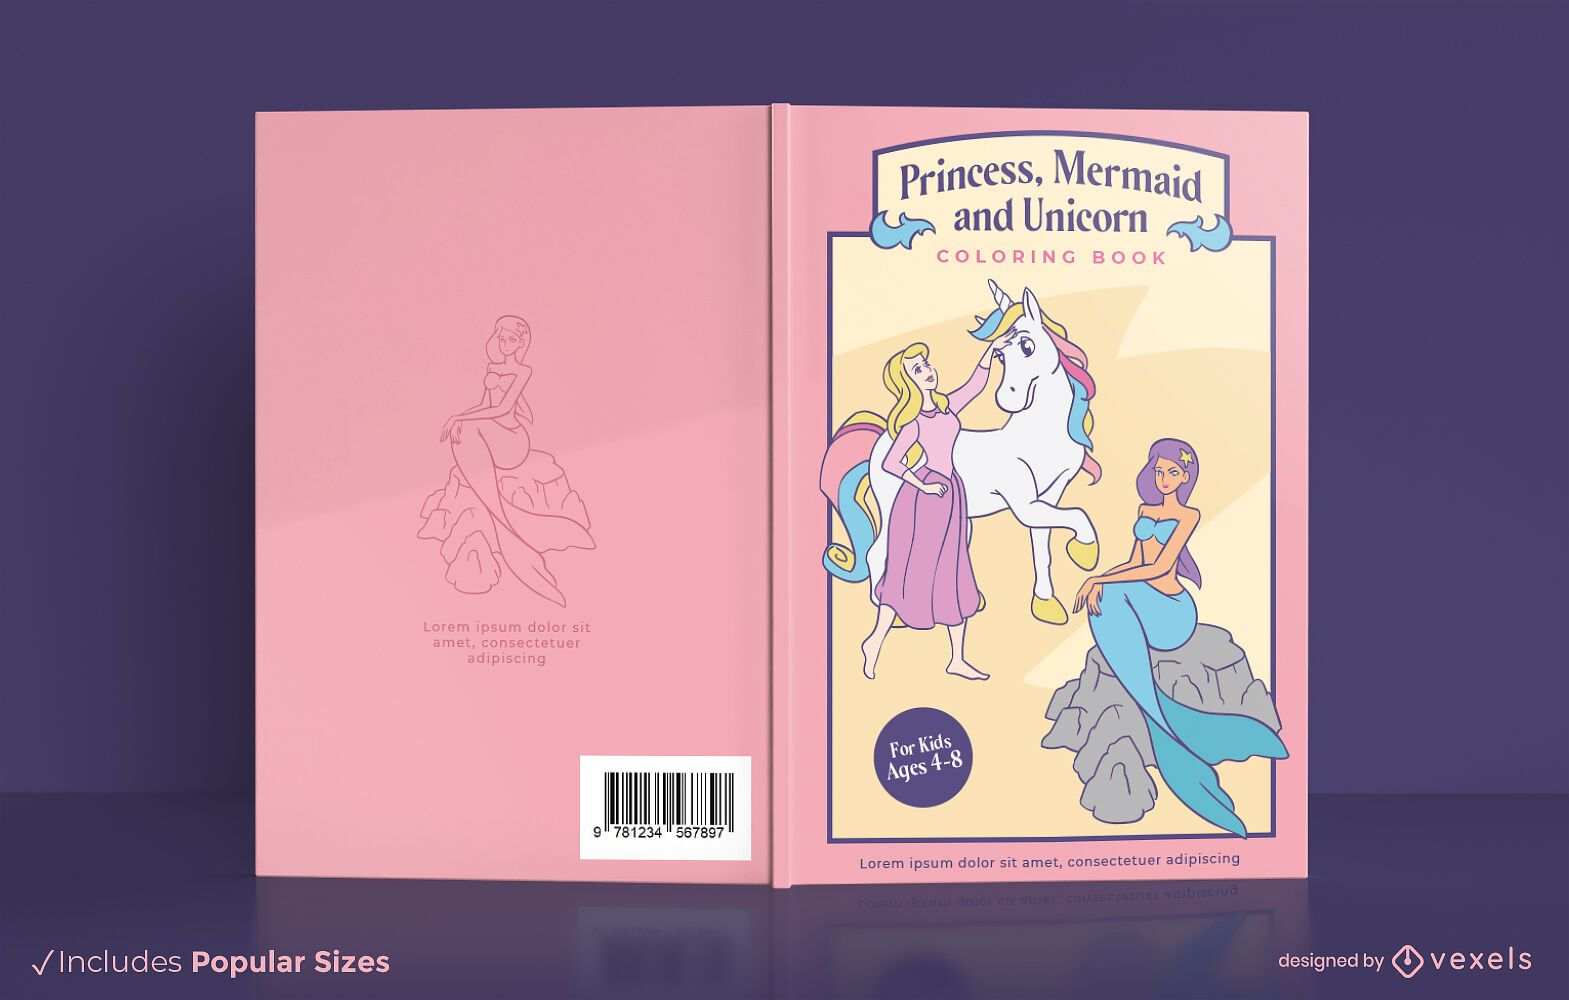 Princess mermaid unicorn book cover design